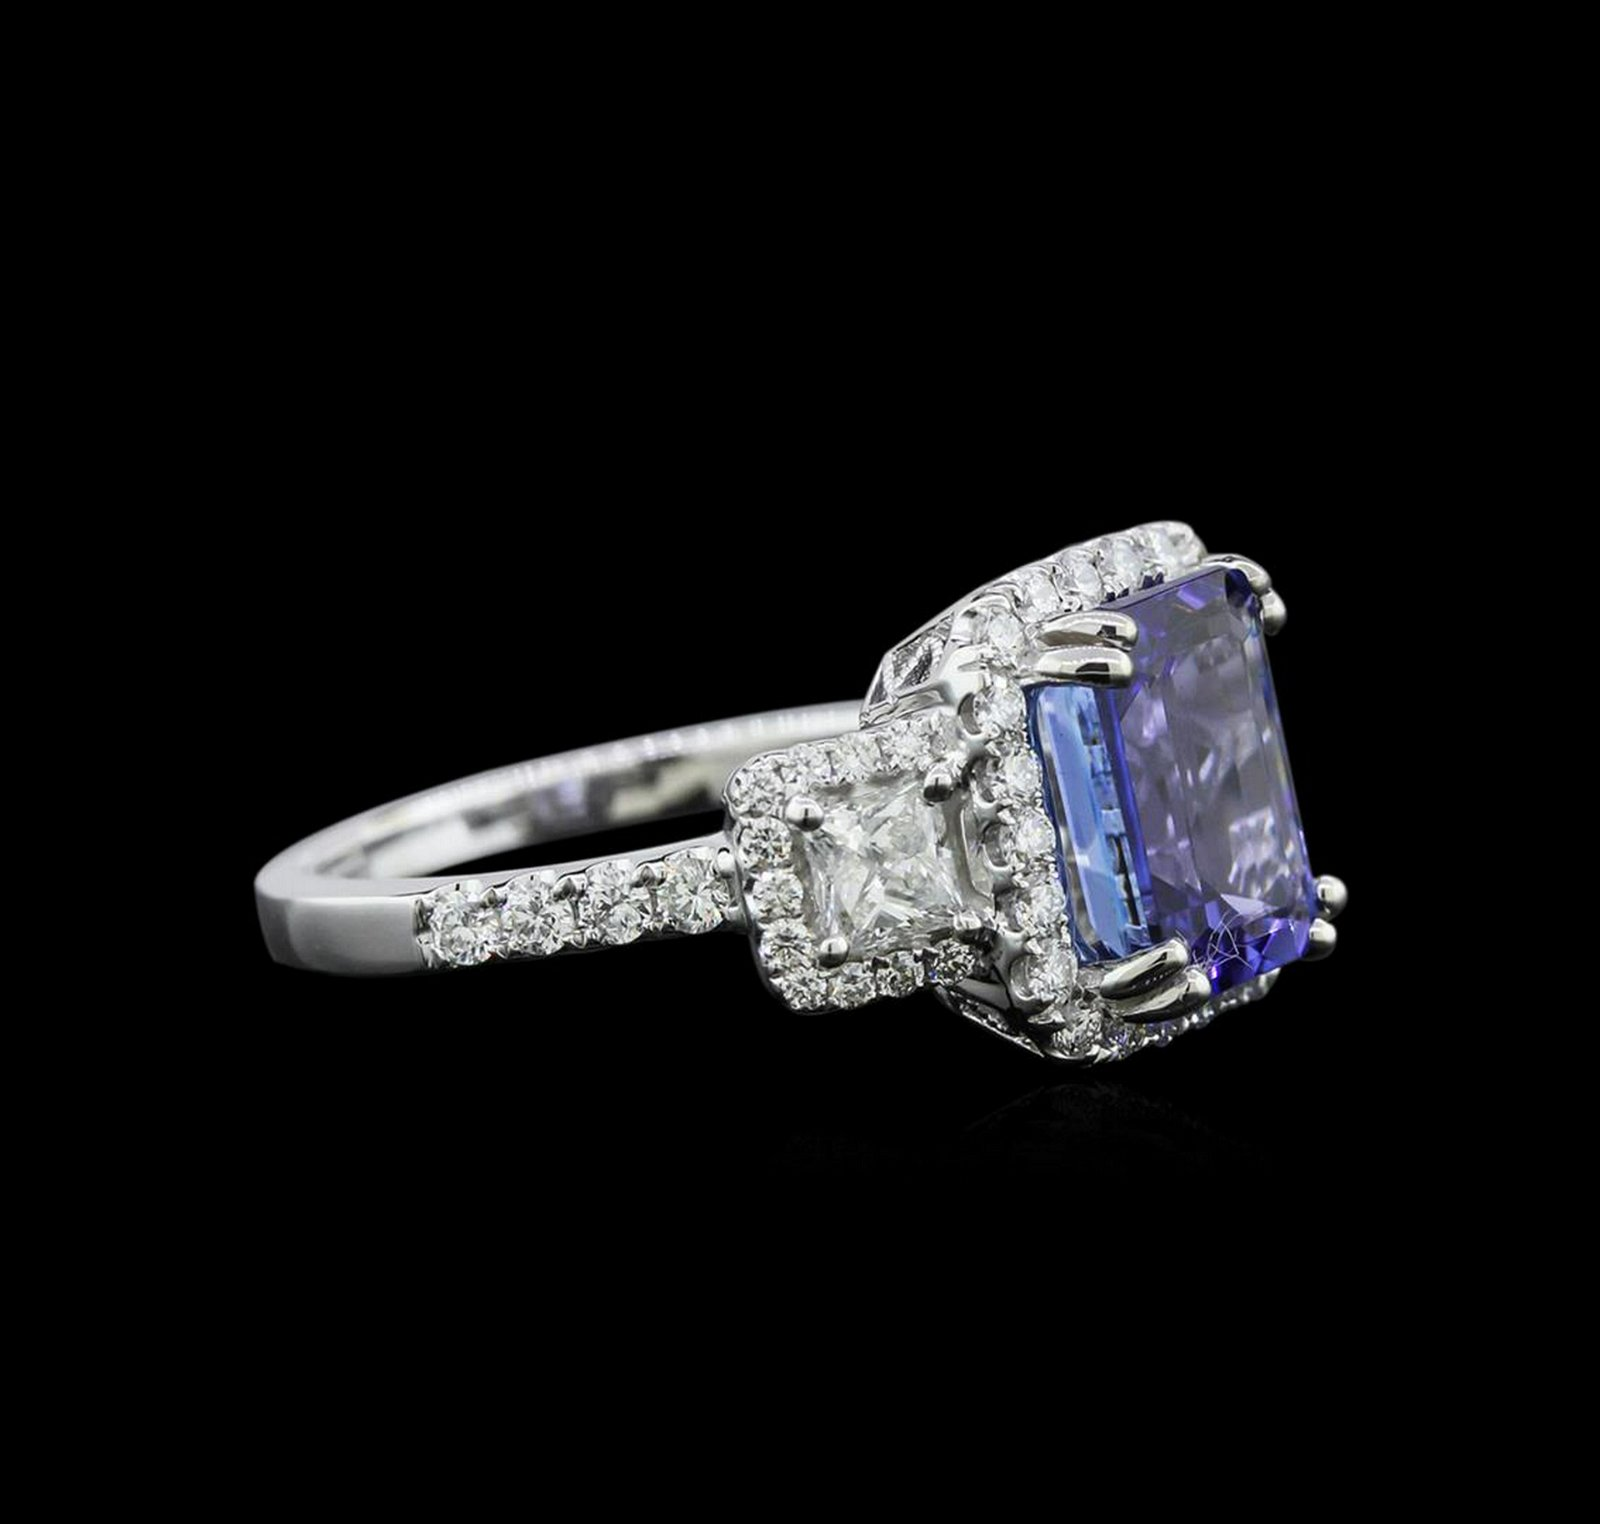 3.35 ctw Tanzanite and Diamond Ring - 18KT White Gold